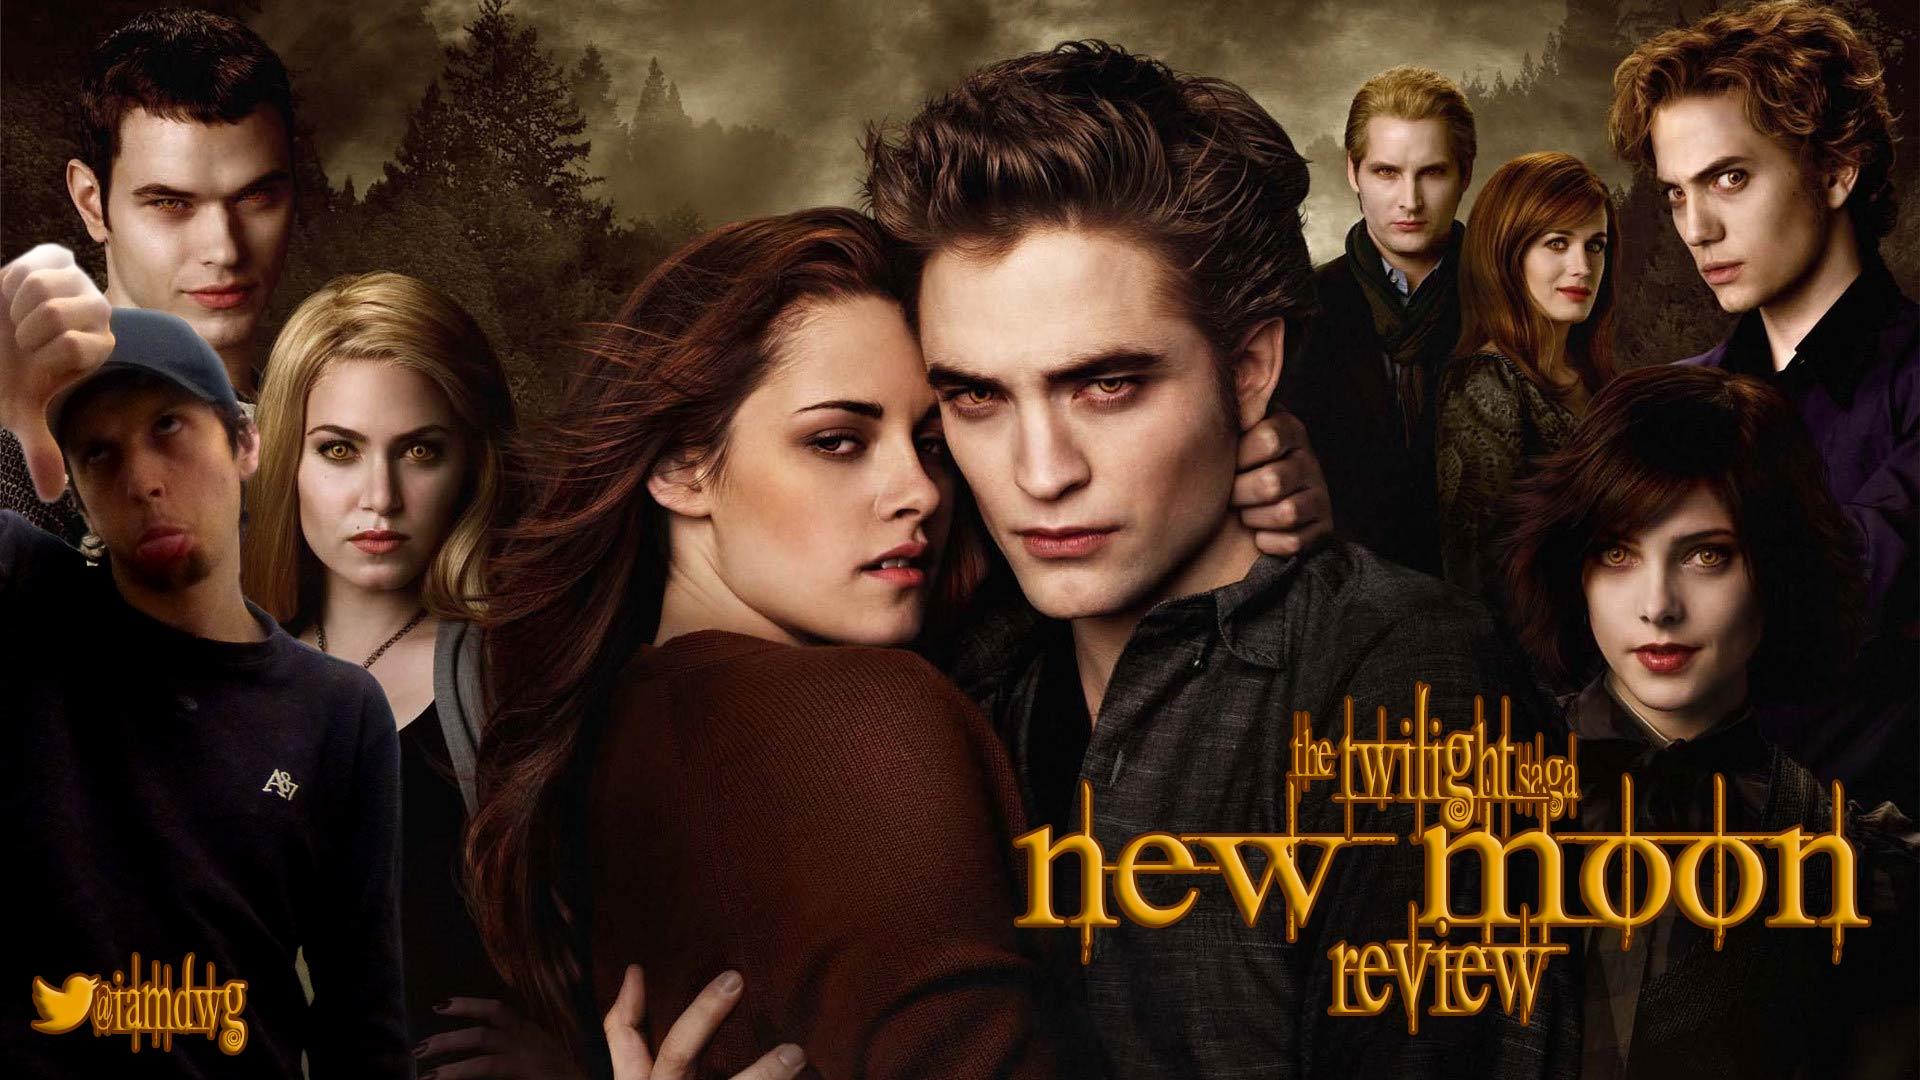 The Twilight Saga New Moon แวมไพร์ ทไวไลท์ 2 2009